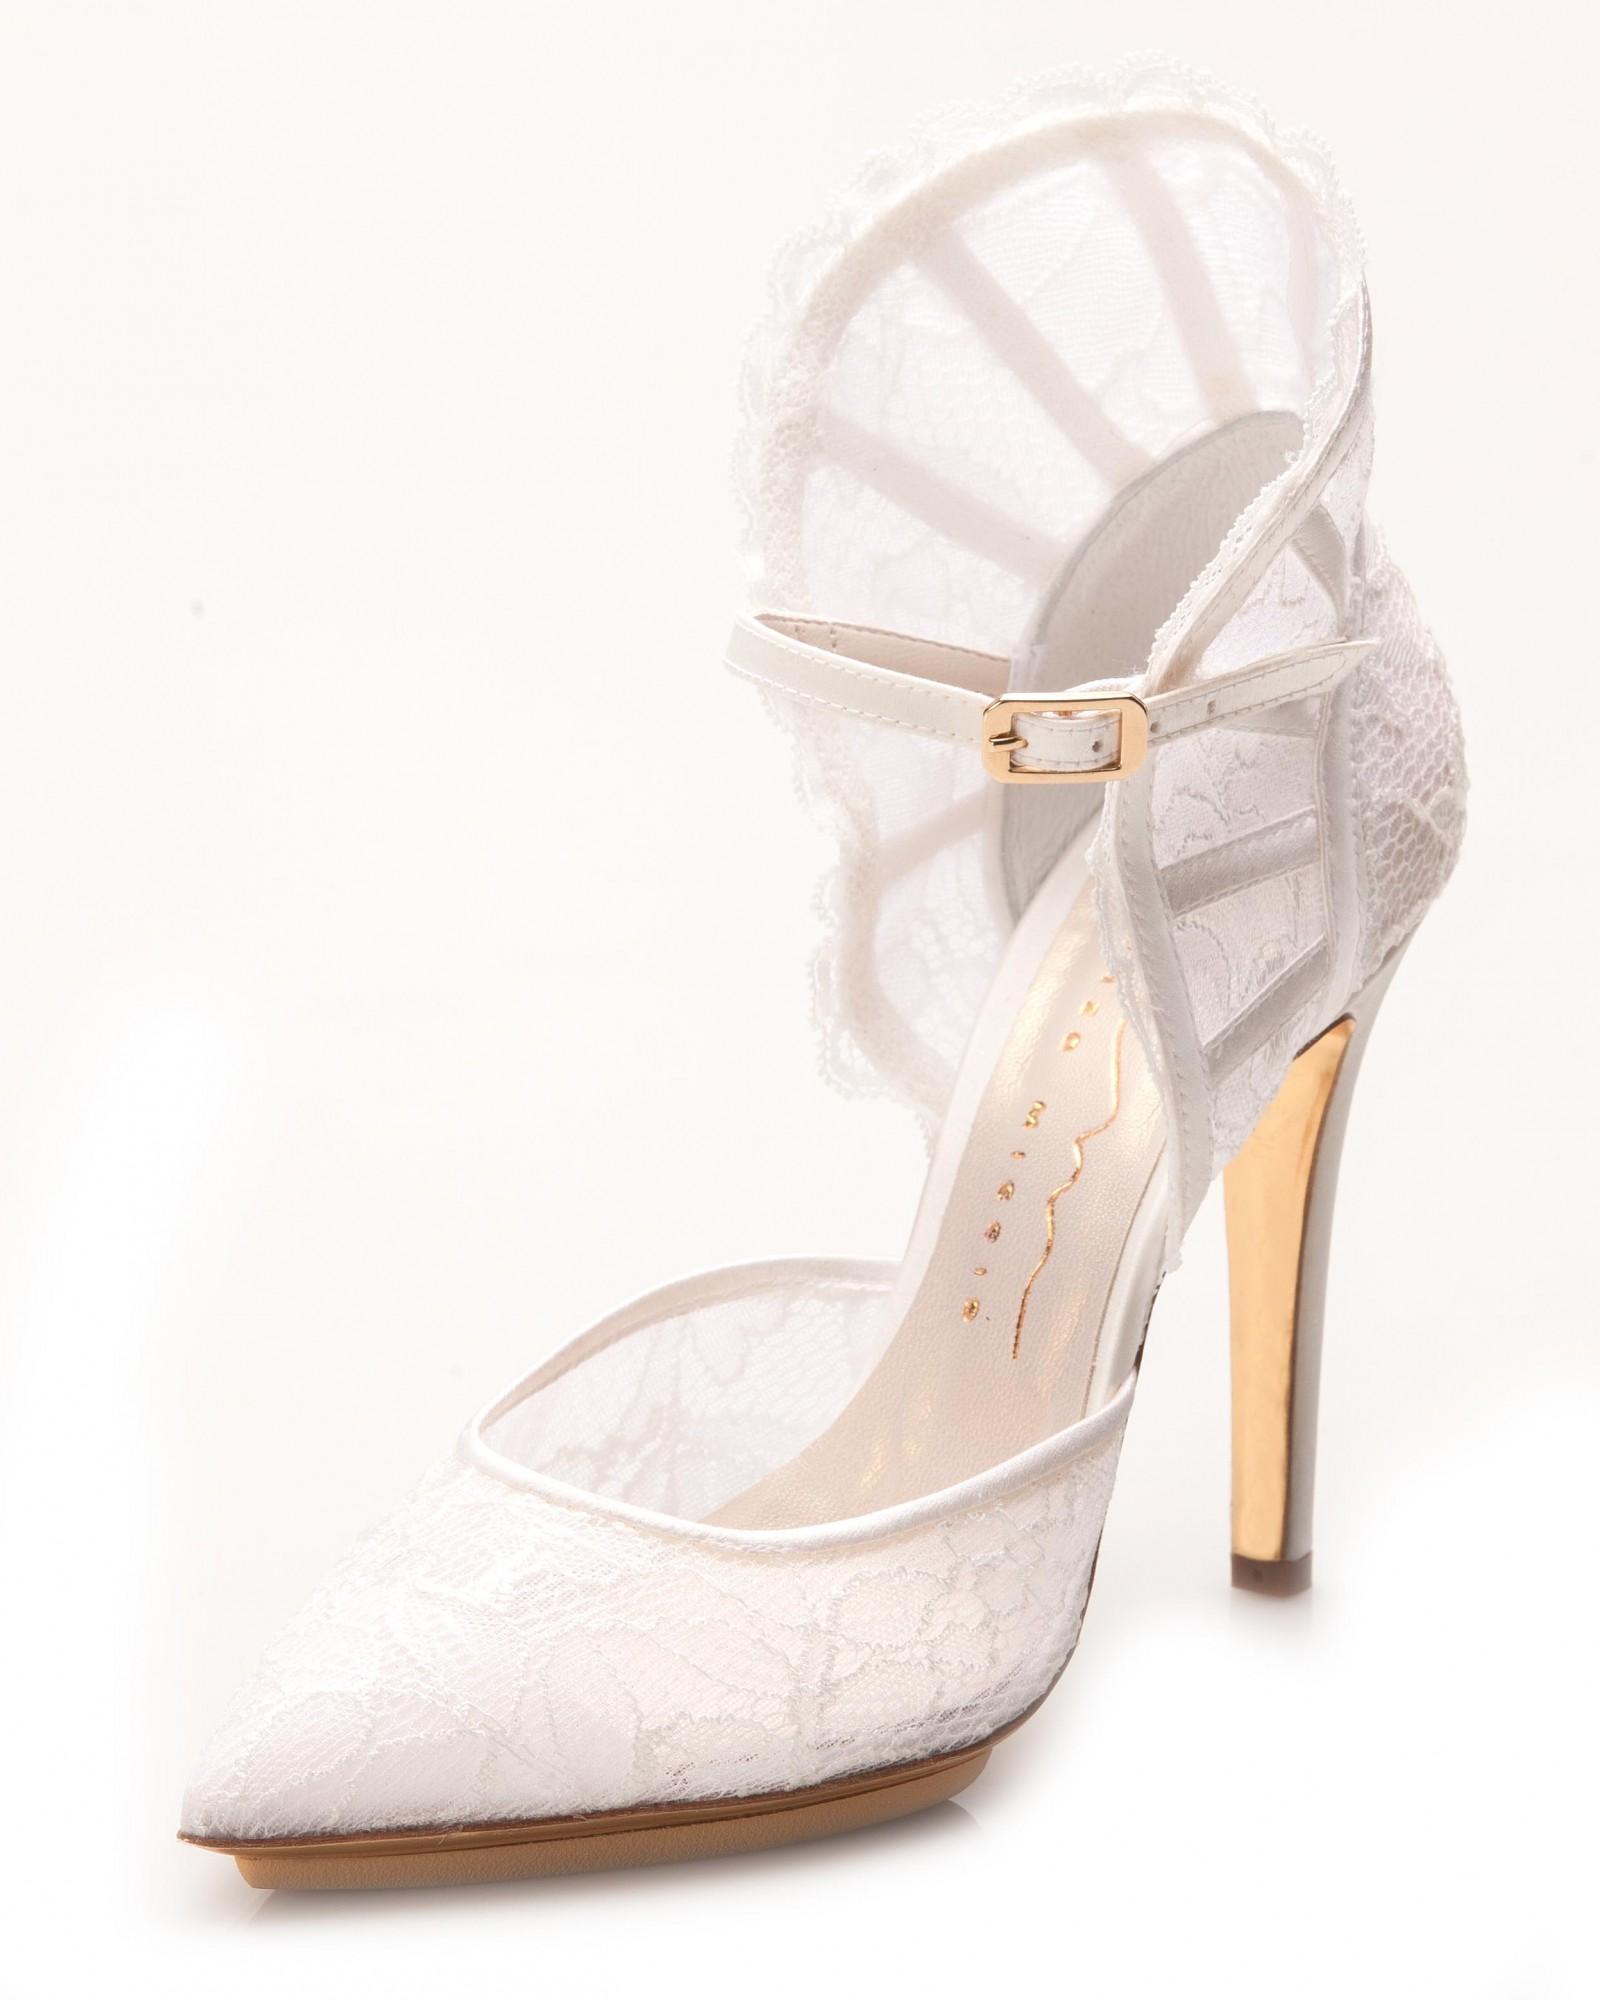 Scarpe Sposa Enzo Miccio.Enzo Miccio Bridal Shoes Scarpe Milenka Puntel